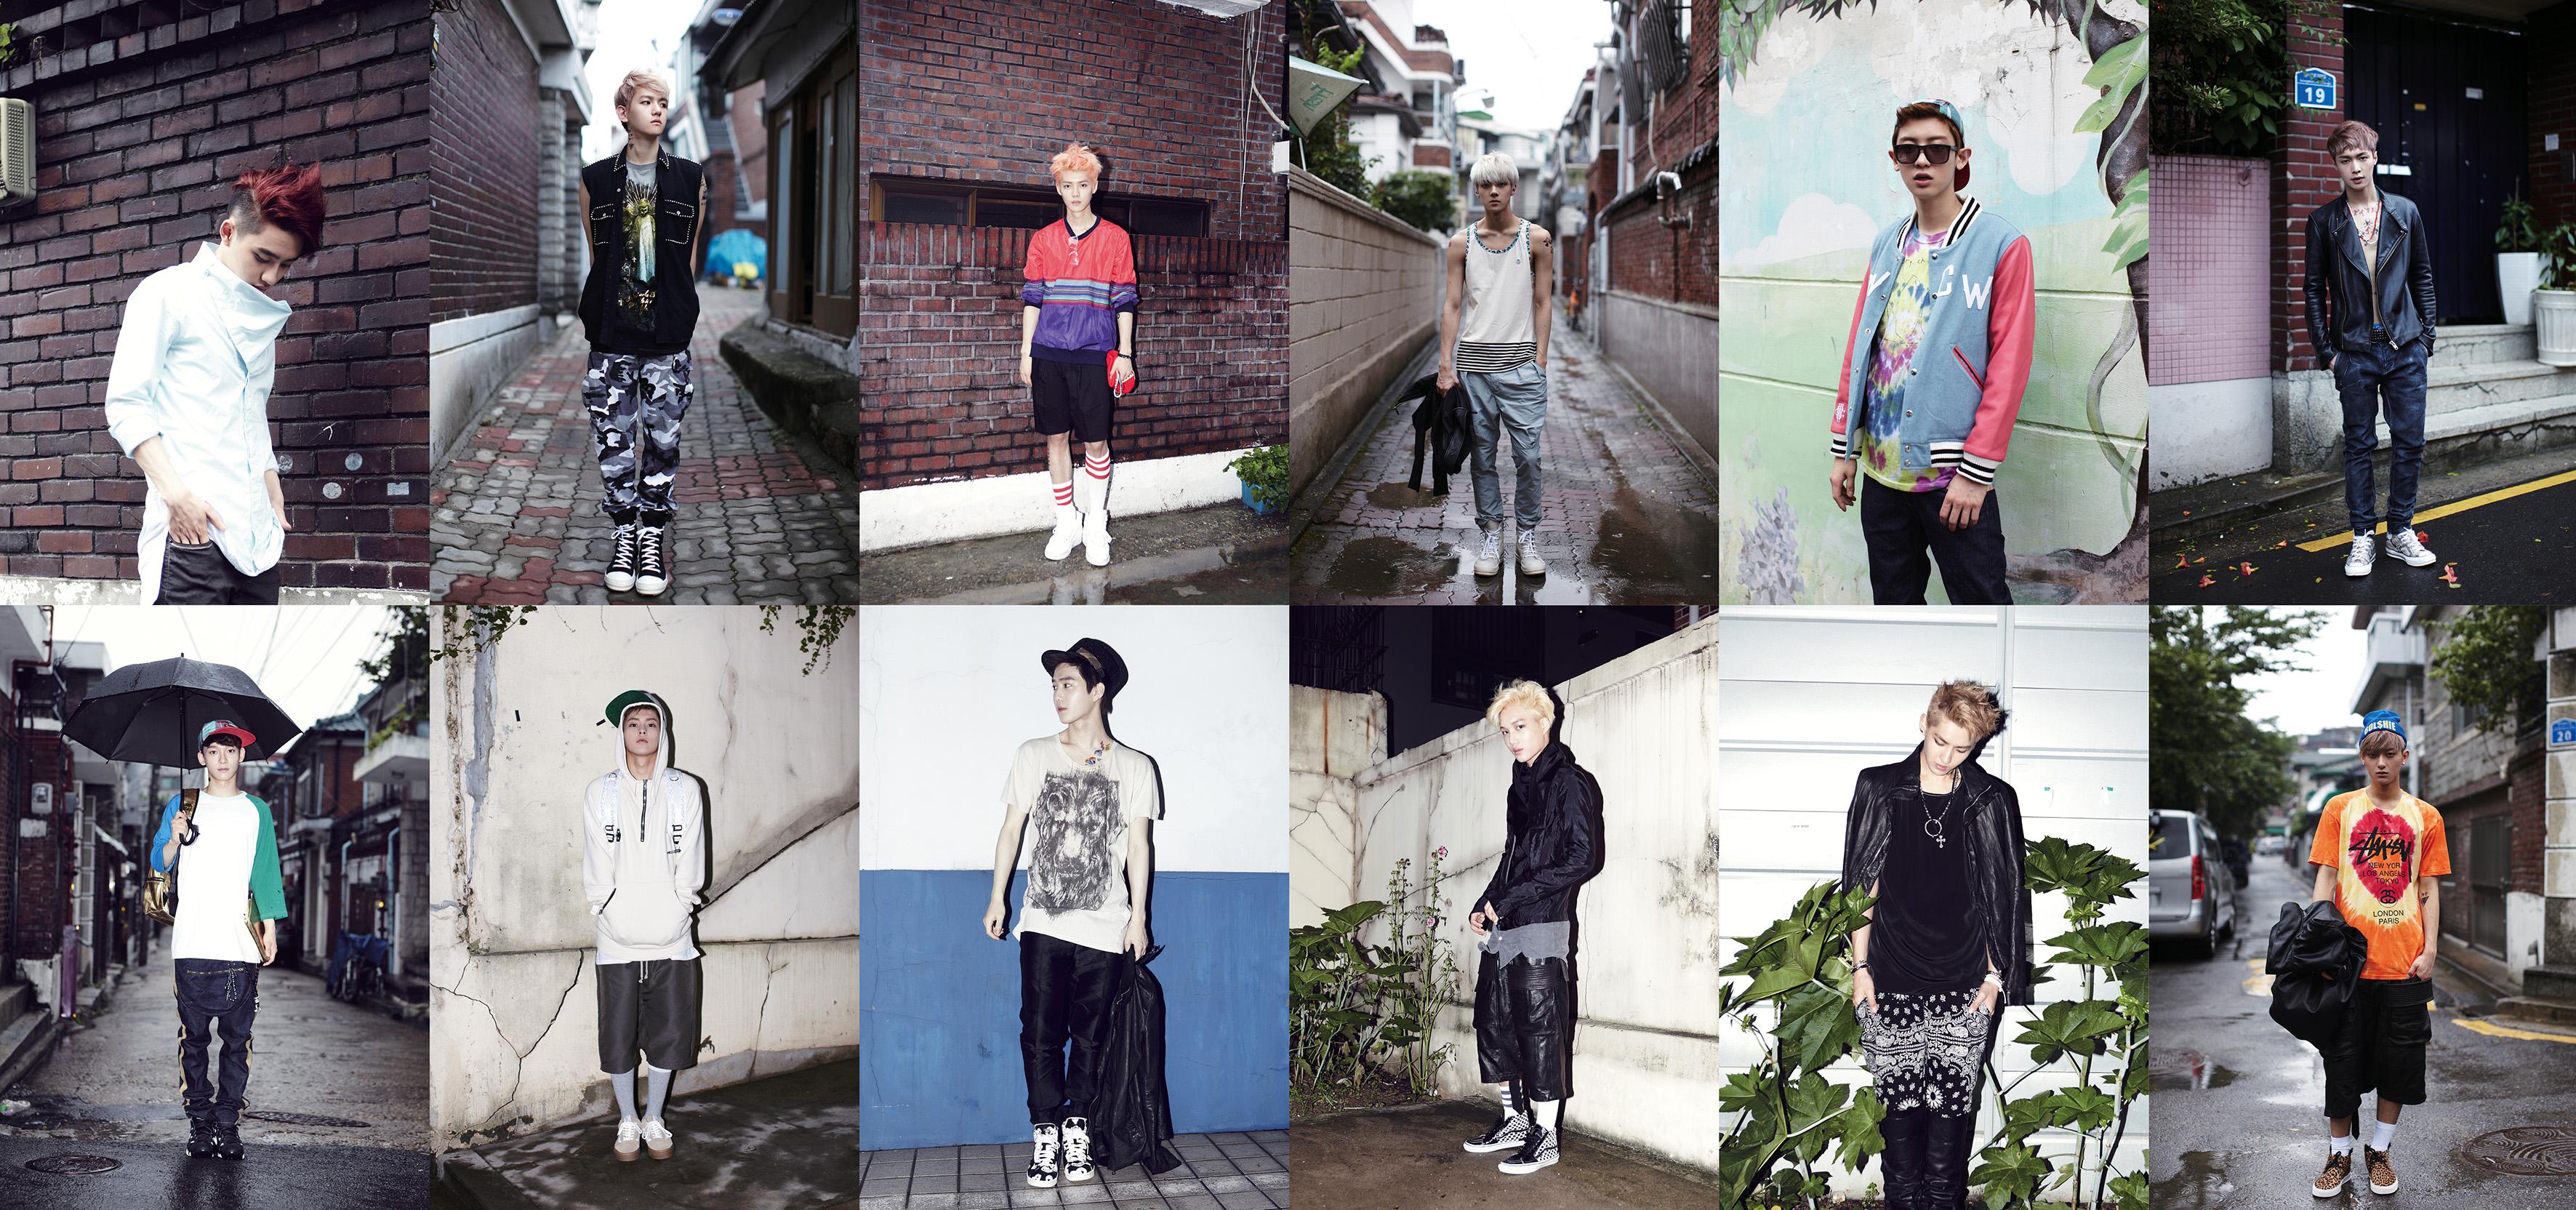 exo repackaged album �growl� ����� teaser photos